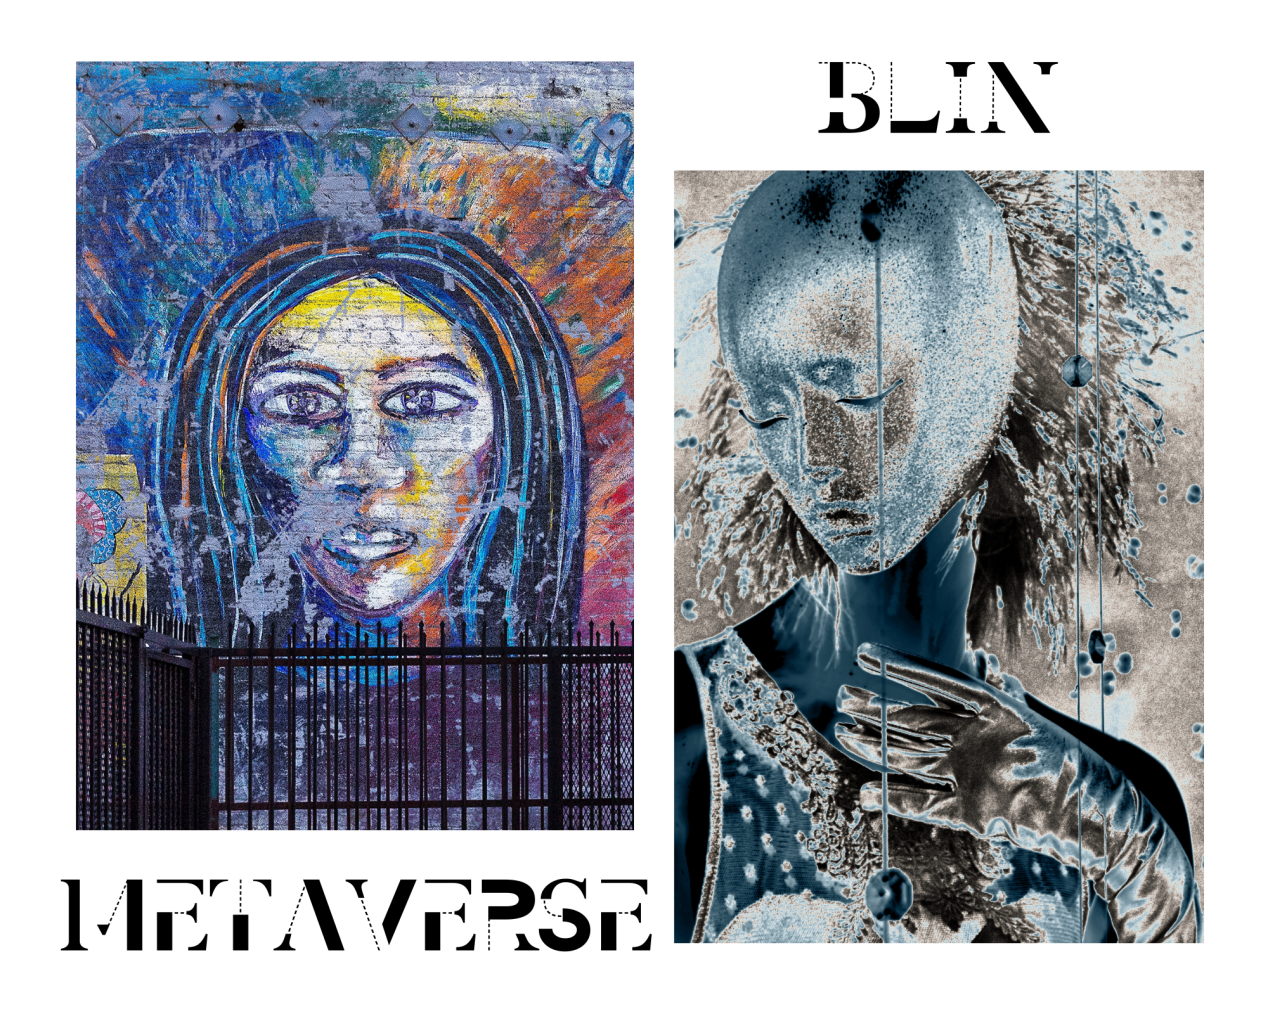 Exploring the Metaverse, Blin Metaverse creates infinite possibilities